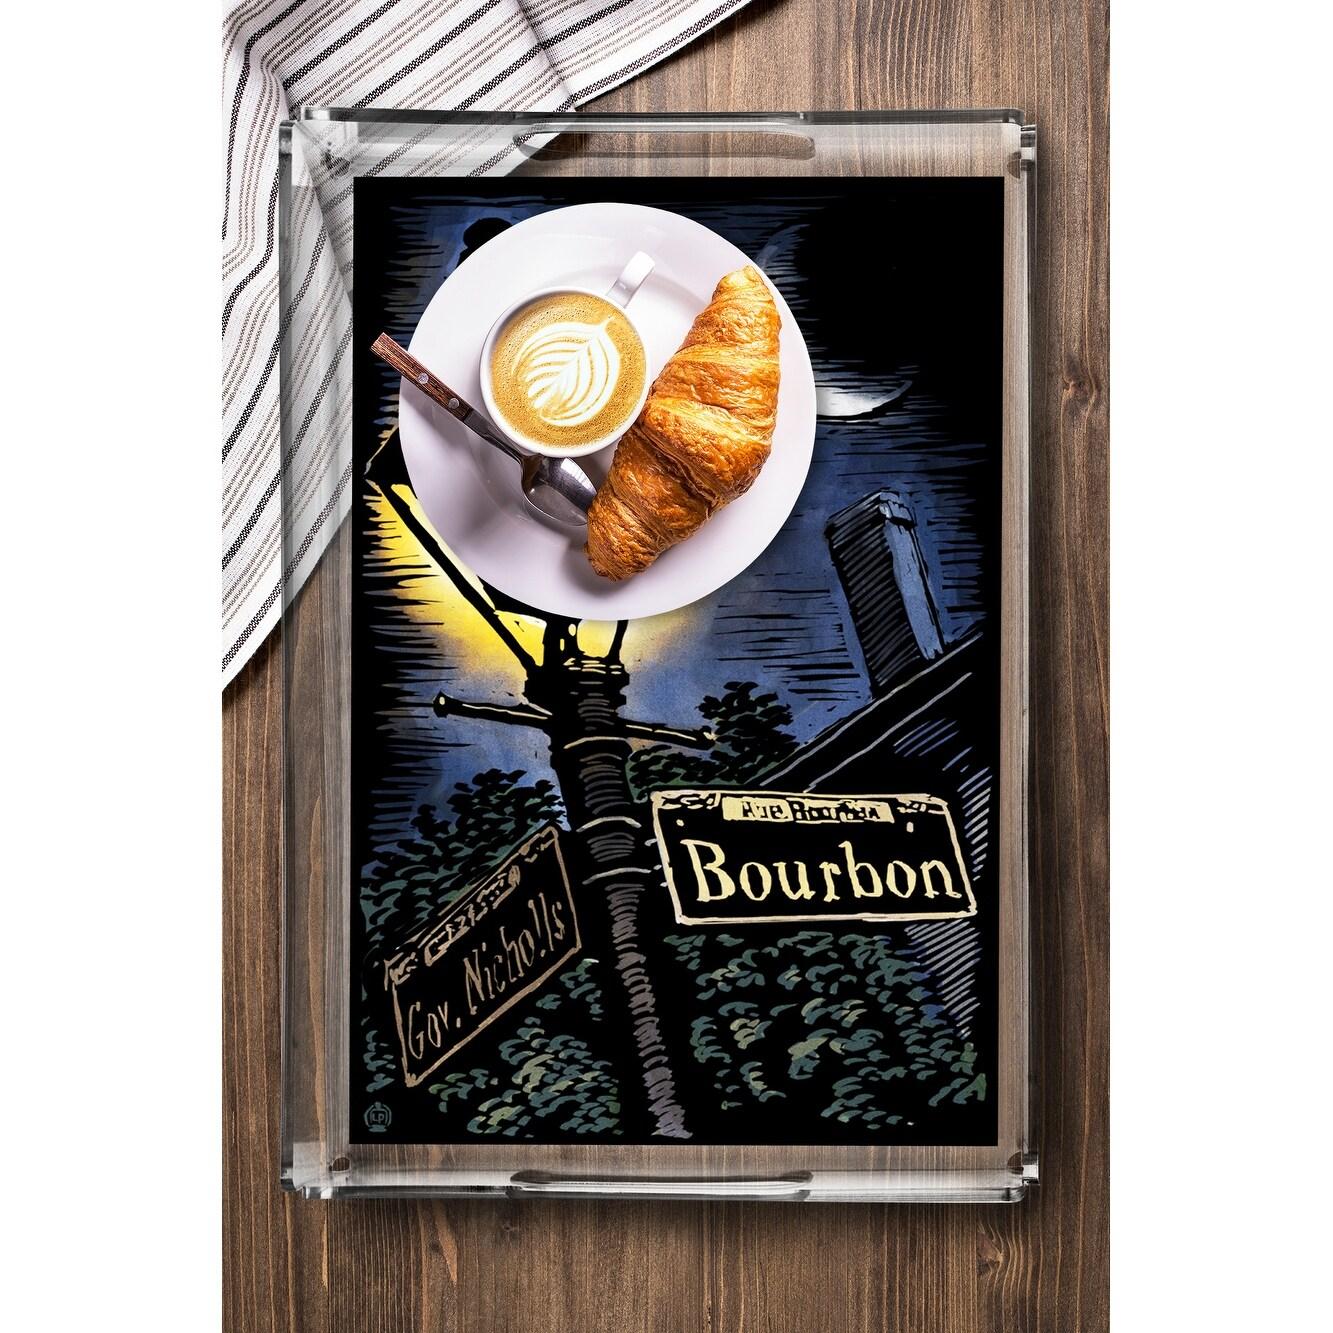 New Orleans Louisiana Bourbon Street Lamppost Scratchboard Lantern Press Artwork Acrylic Serving Tray